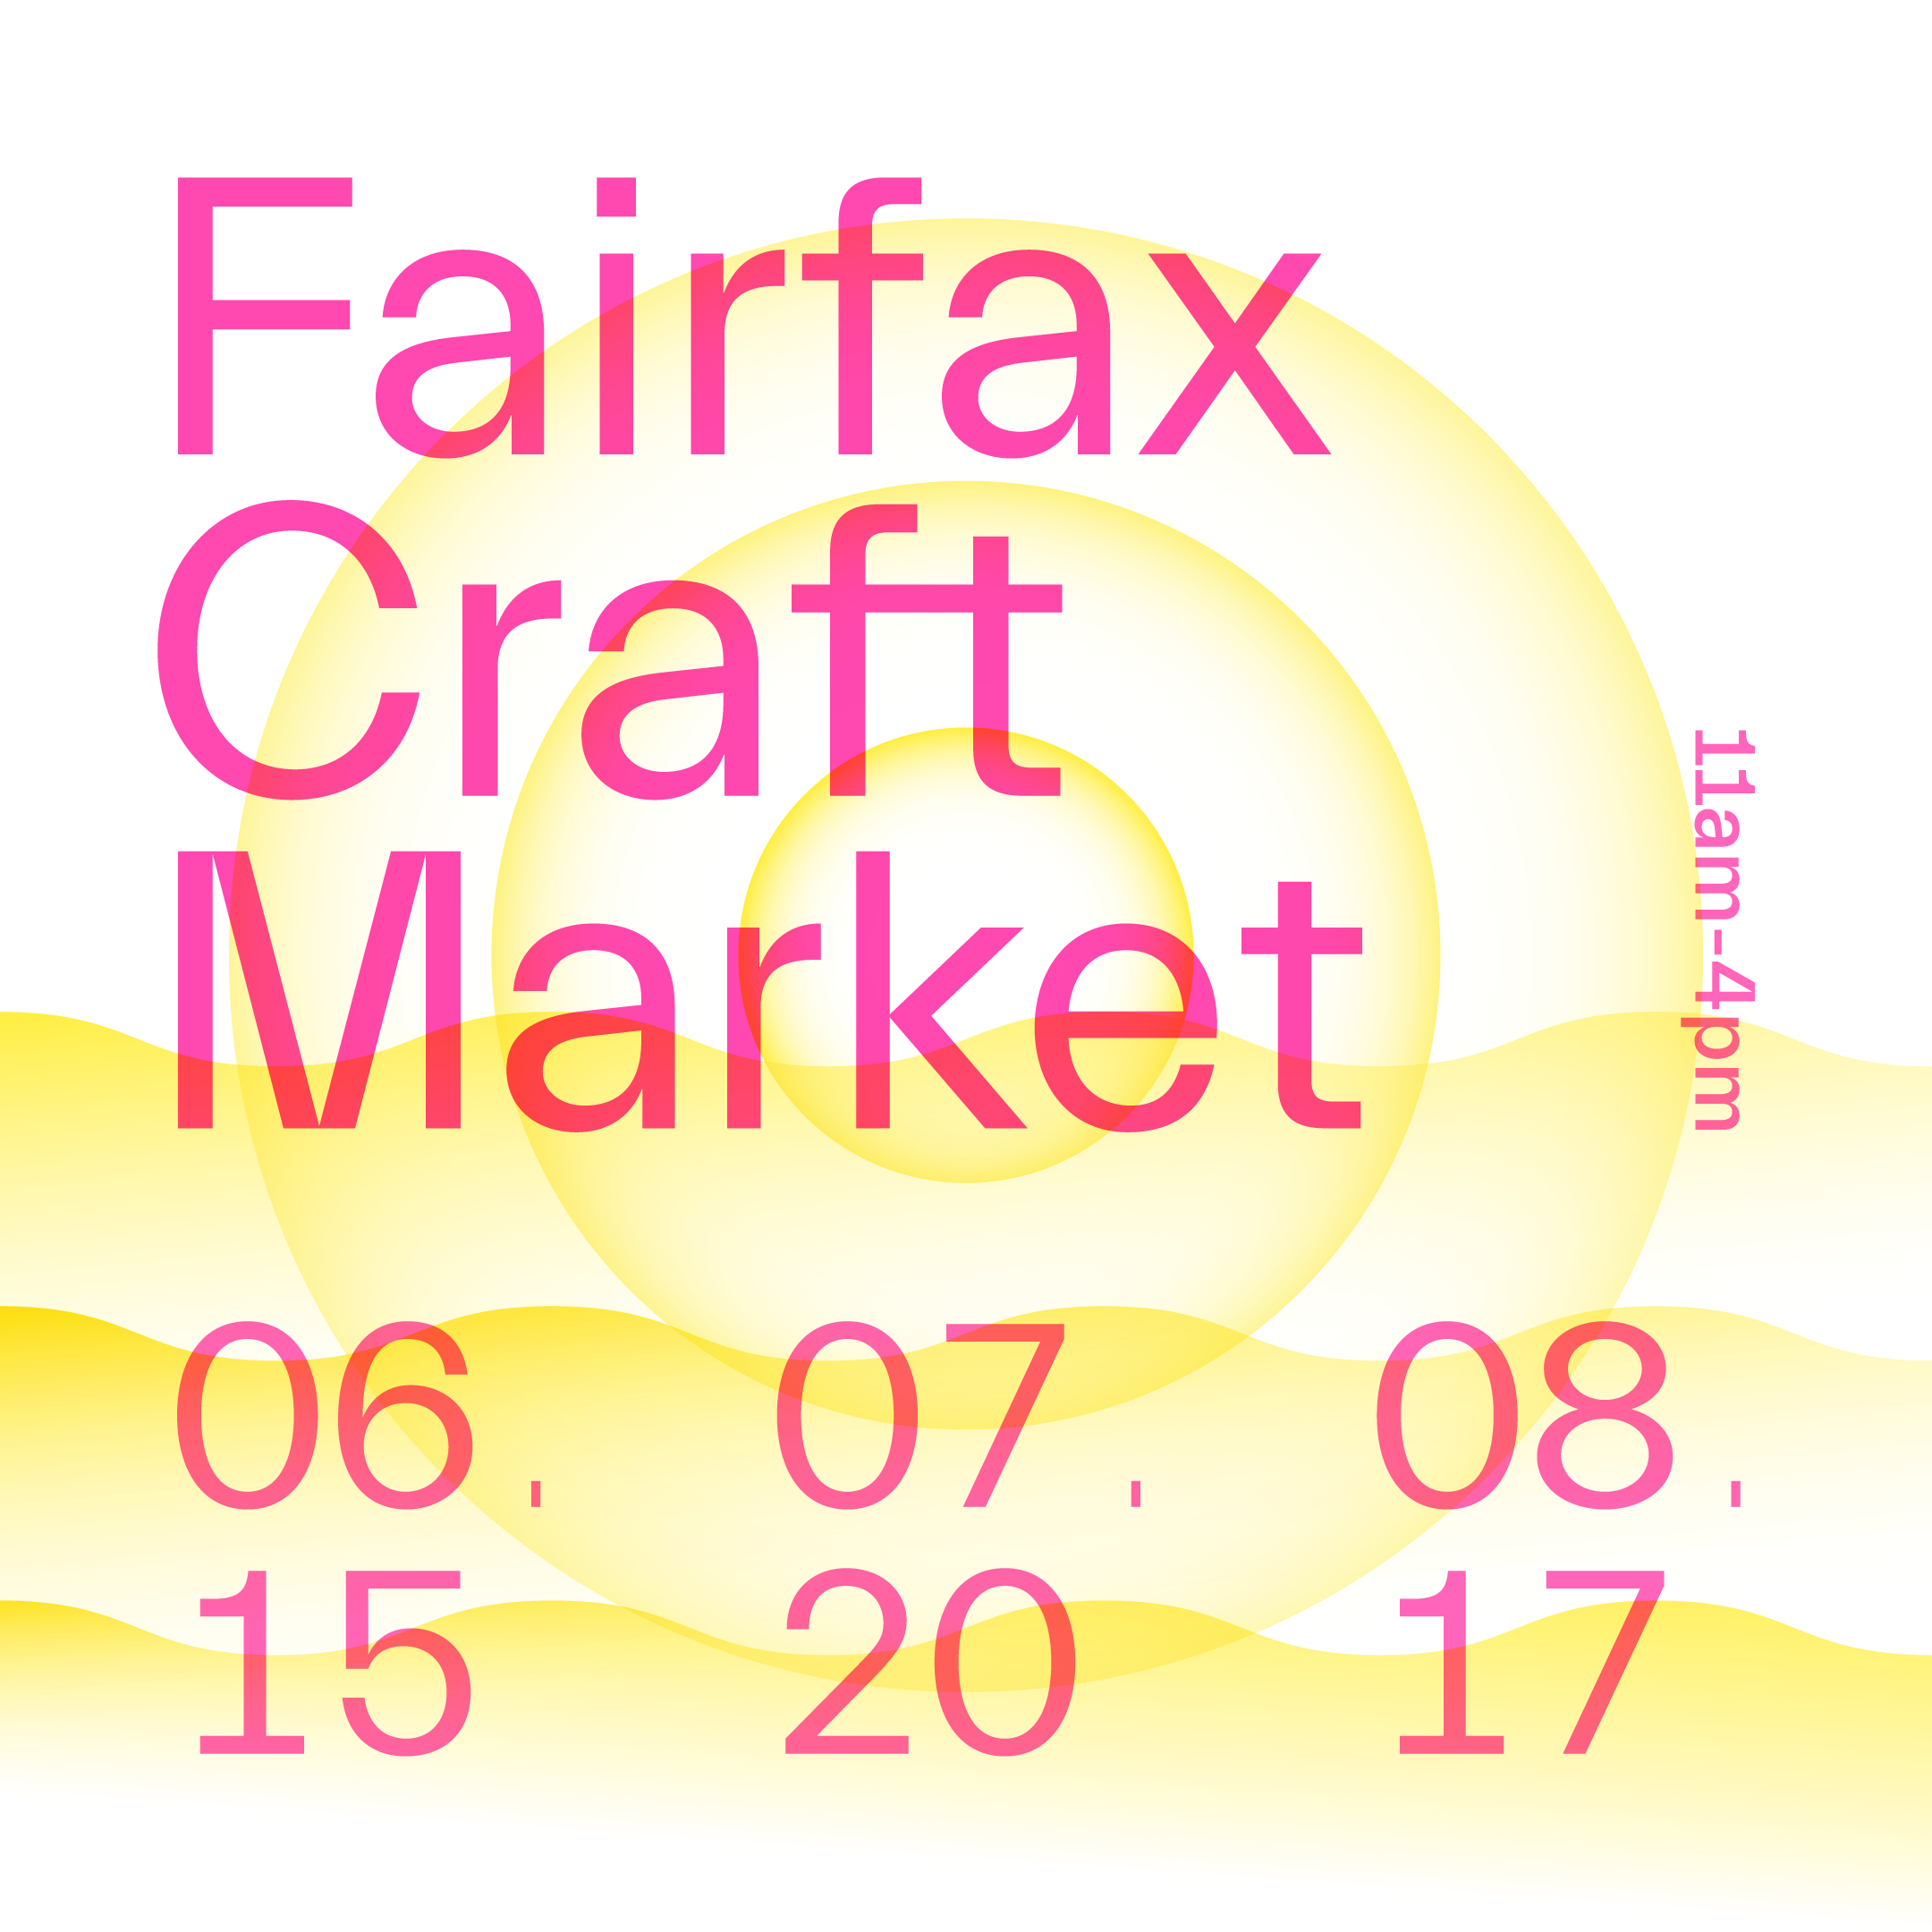 FairfaxCraftMarket_social_front_ylw.png